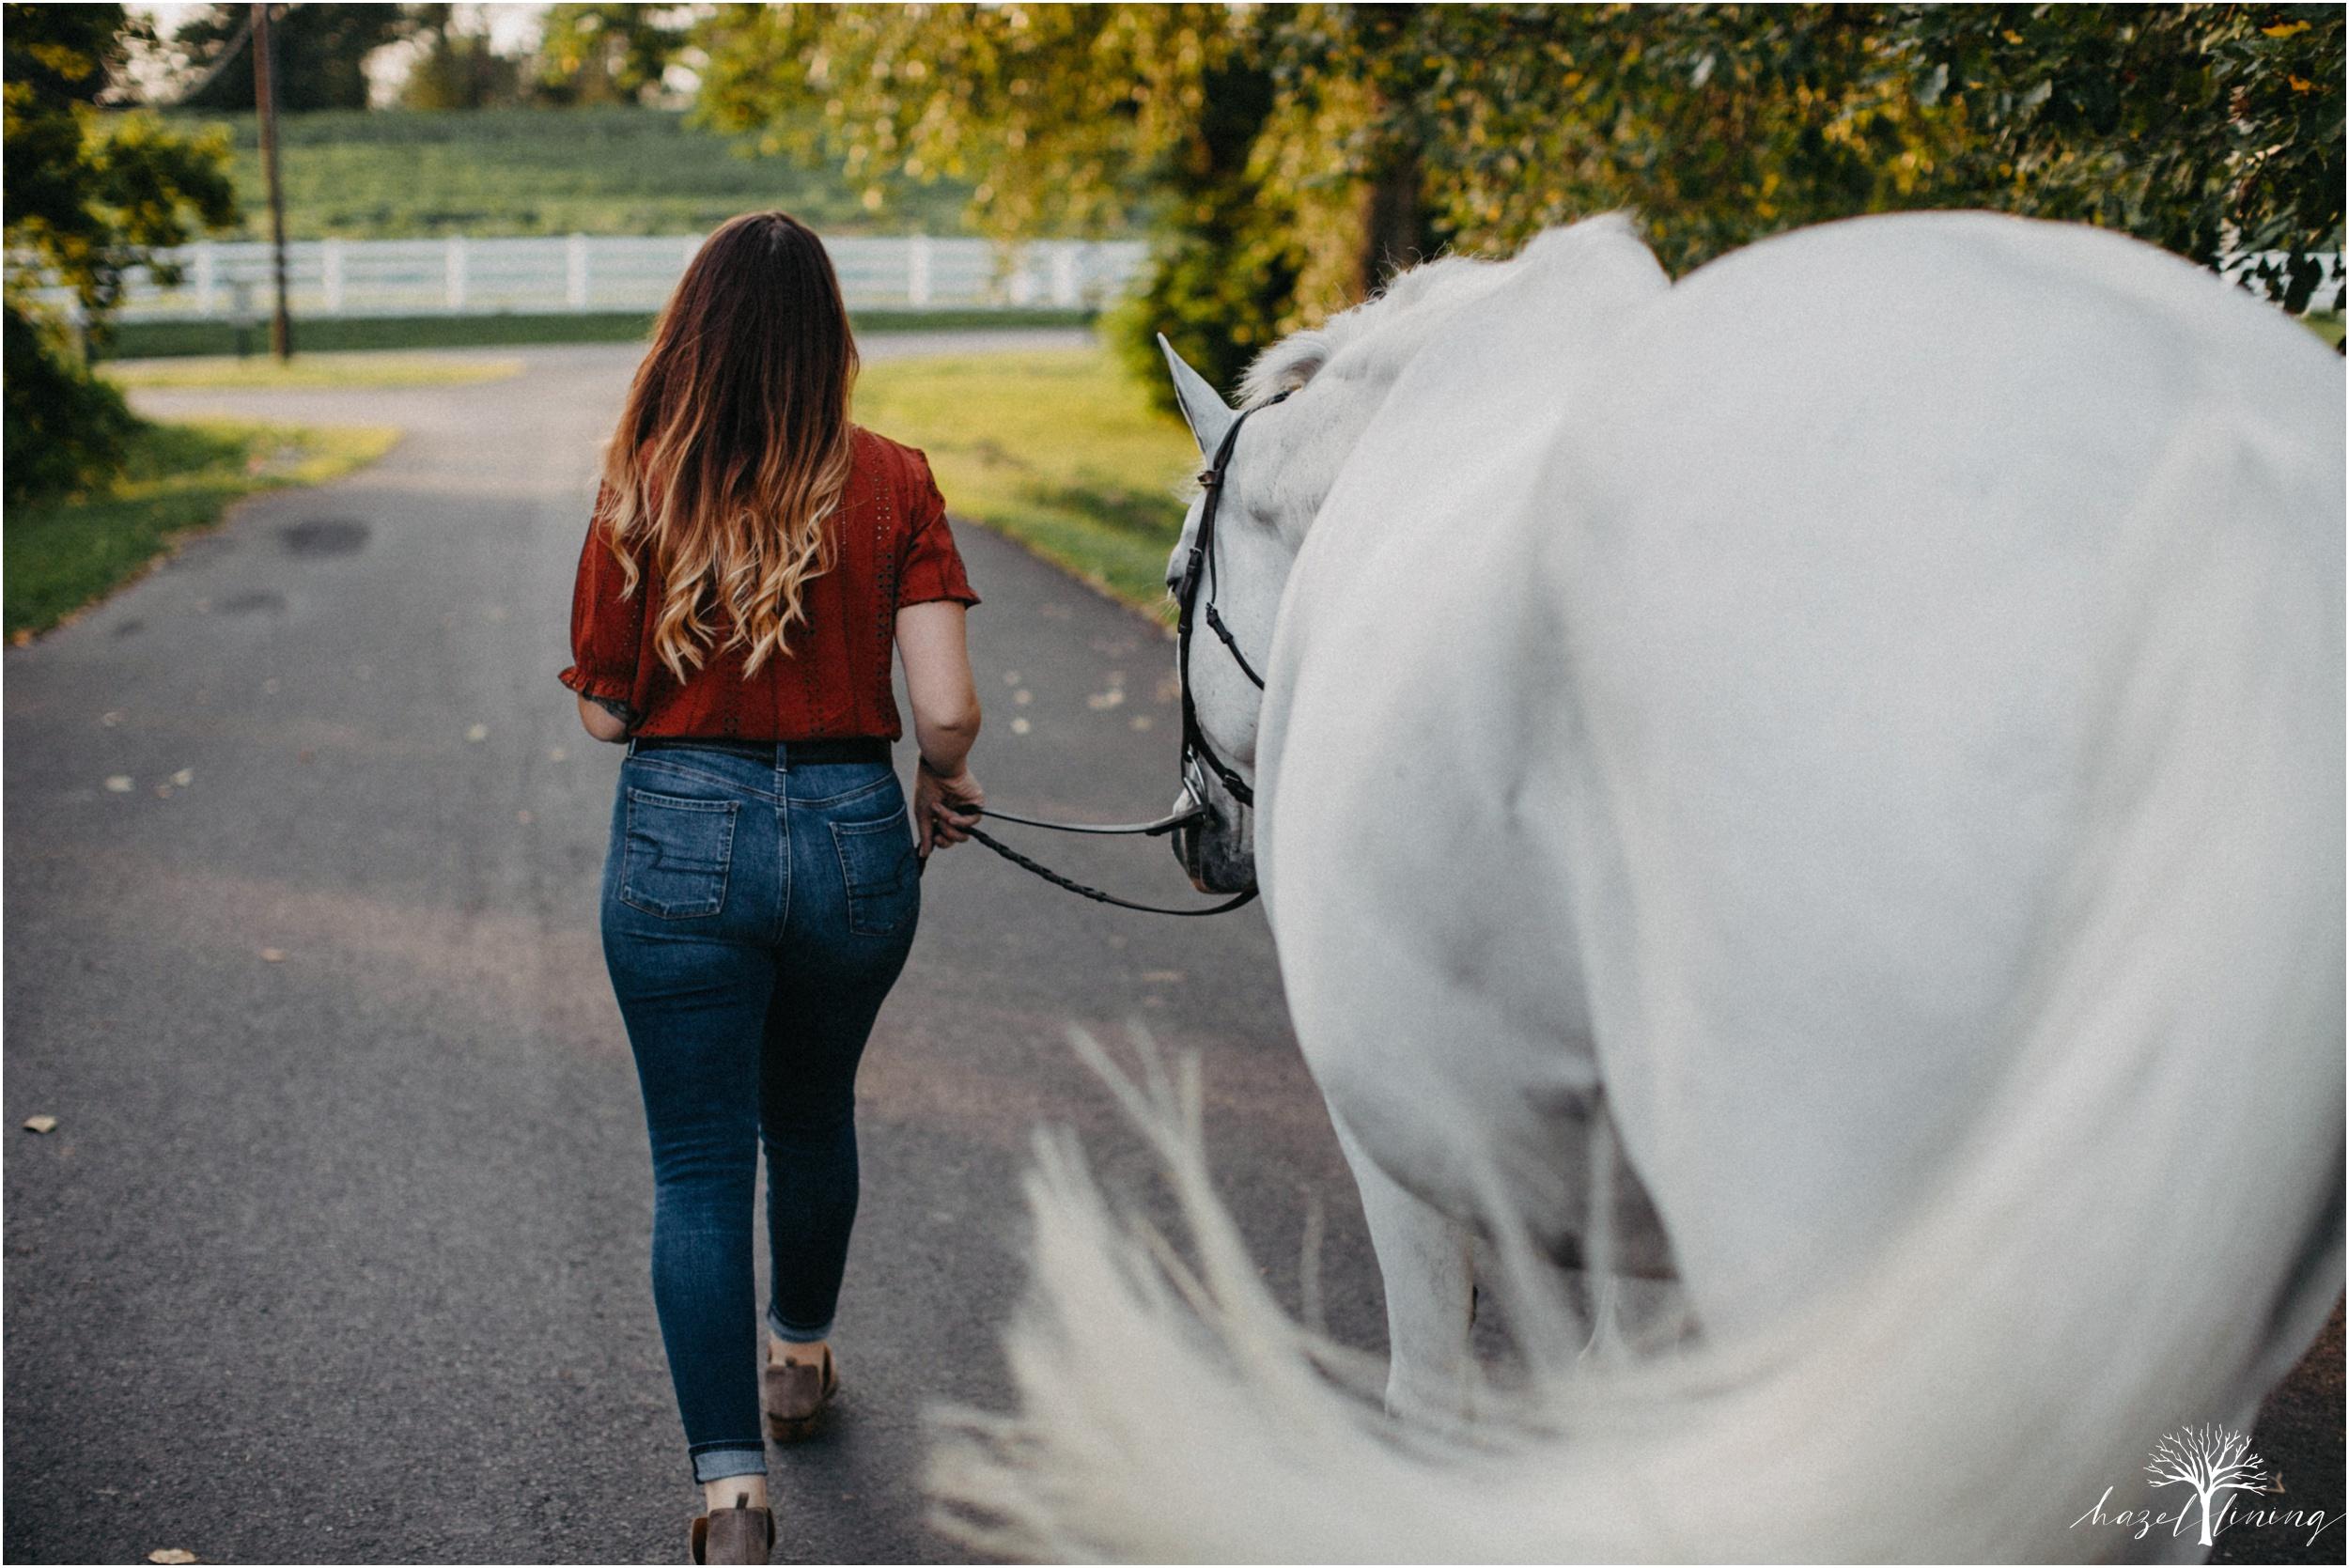 taylor-adams-and-horse-delaware-valley-university-delval-summer-equestrian-portrait-session-hazel-lining-photography-destination-elopement-wedding-engagement-photography_0013.jpg